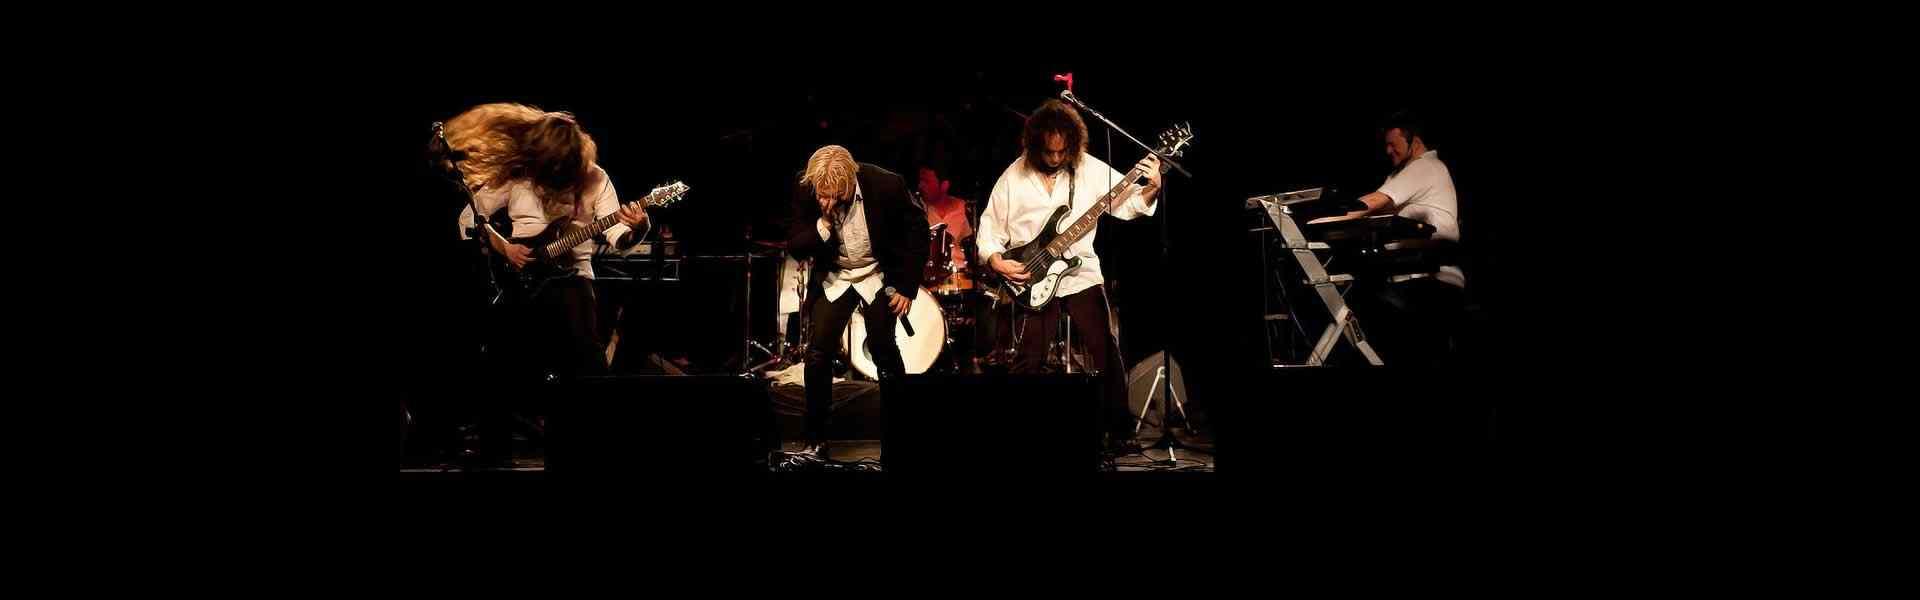 http://www.fughu.com/wp-content/uploads/2014/12/Fughu-Progressive-Metal.jpg